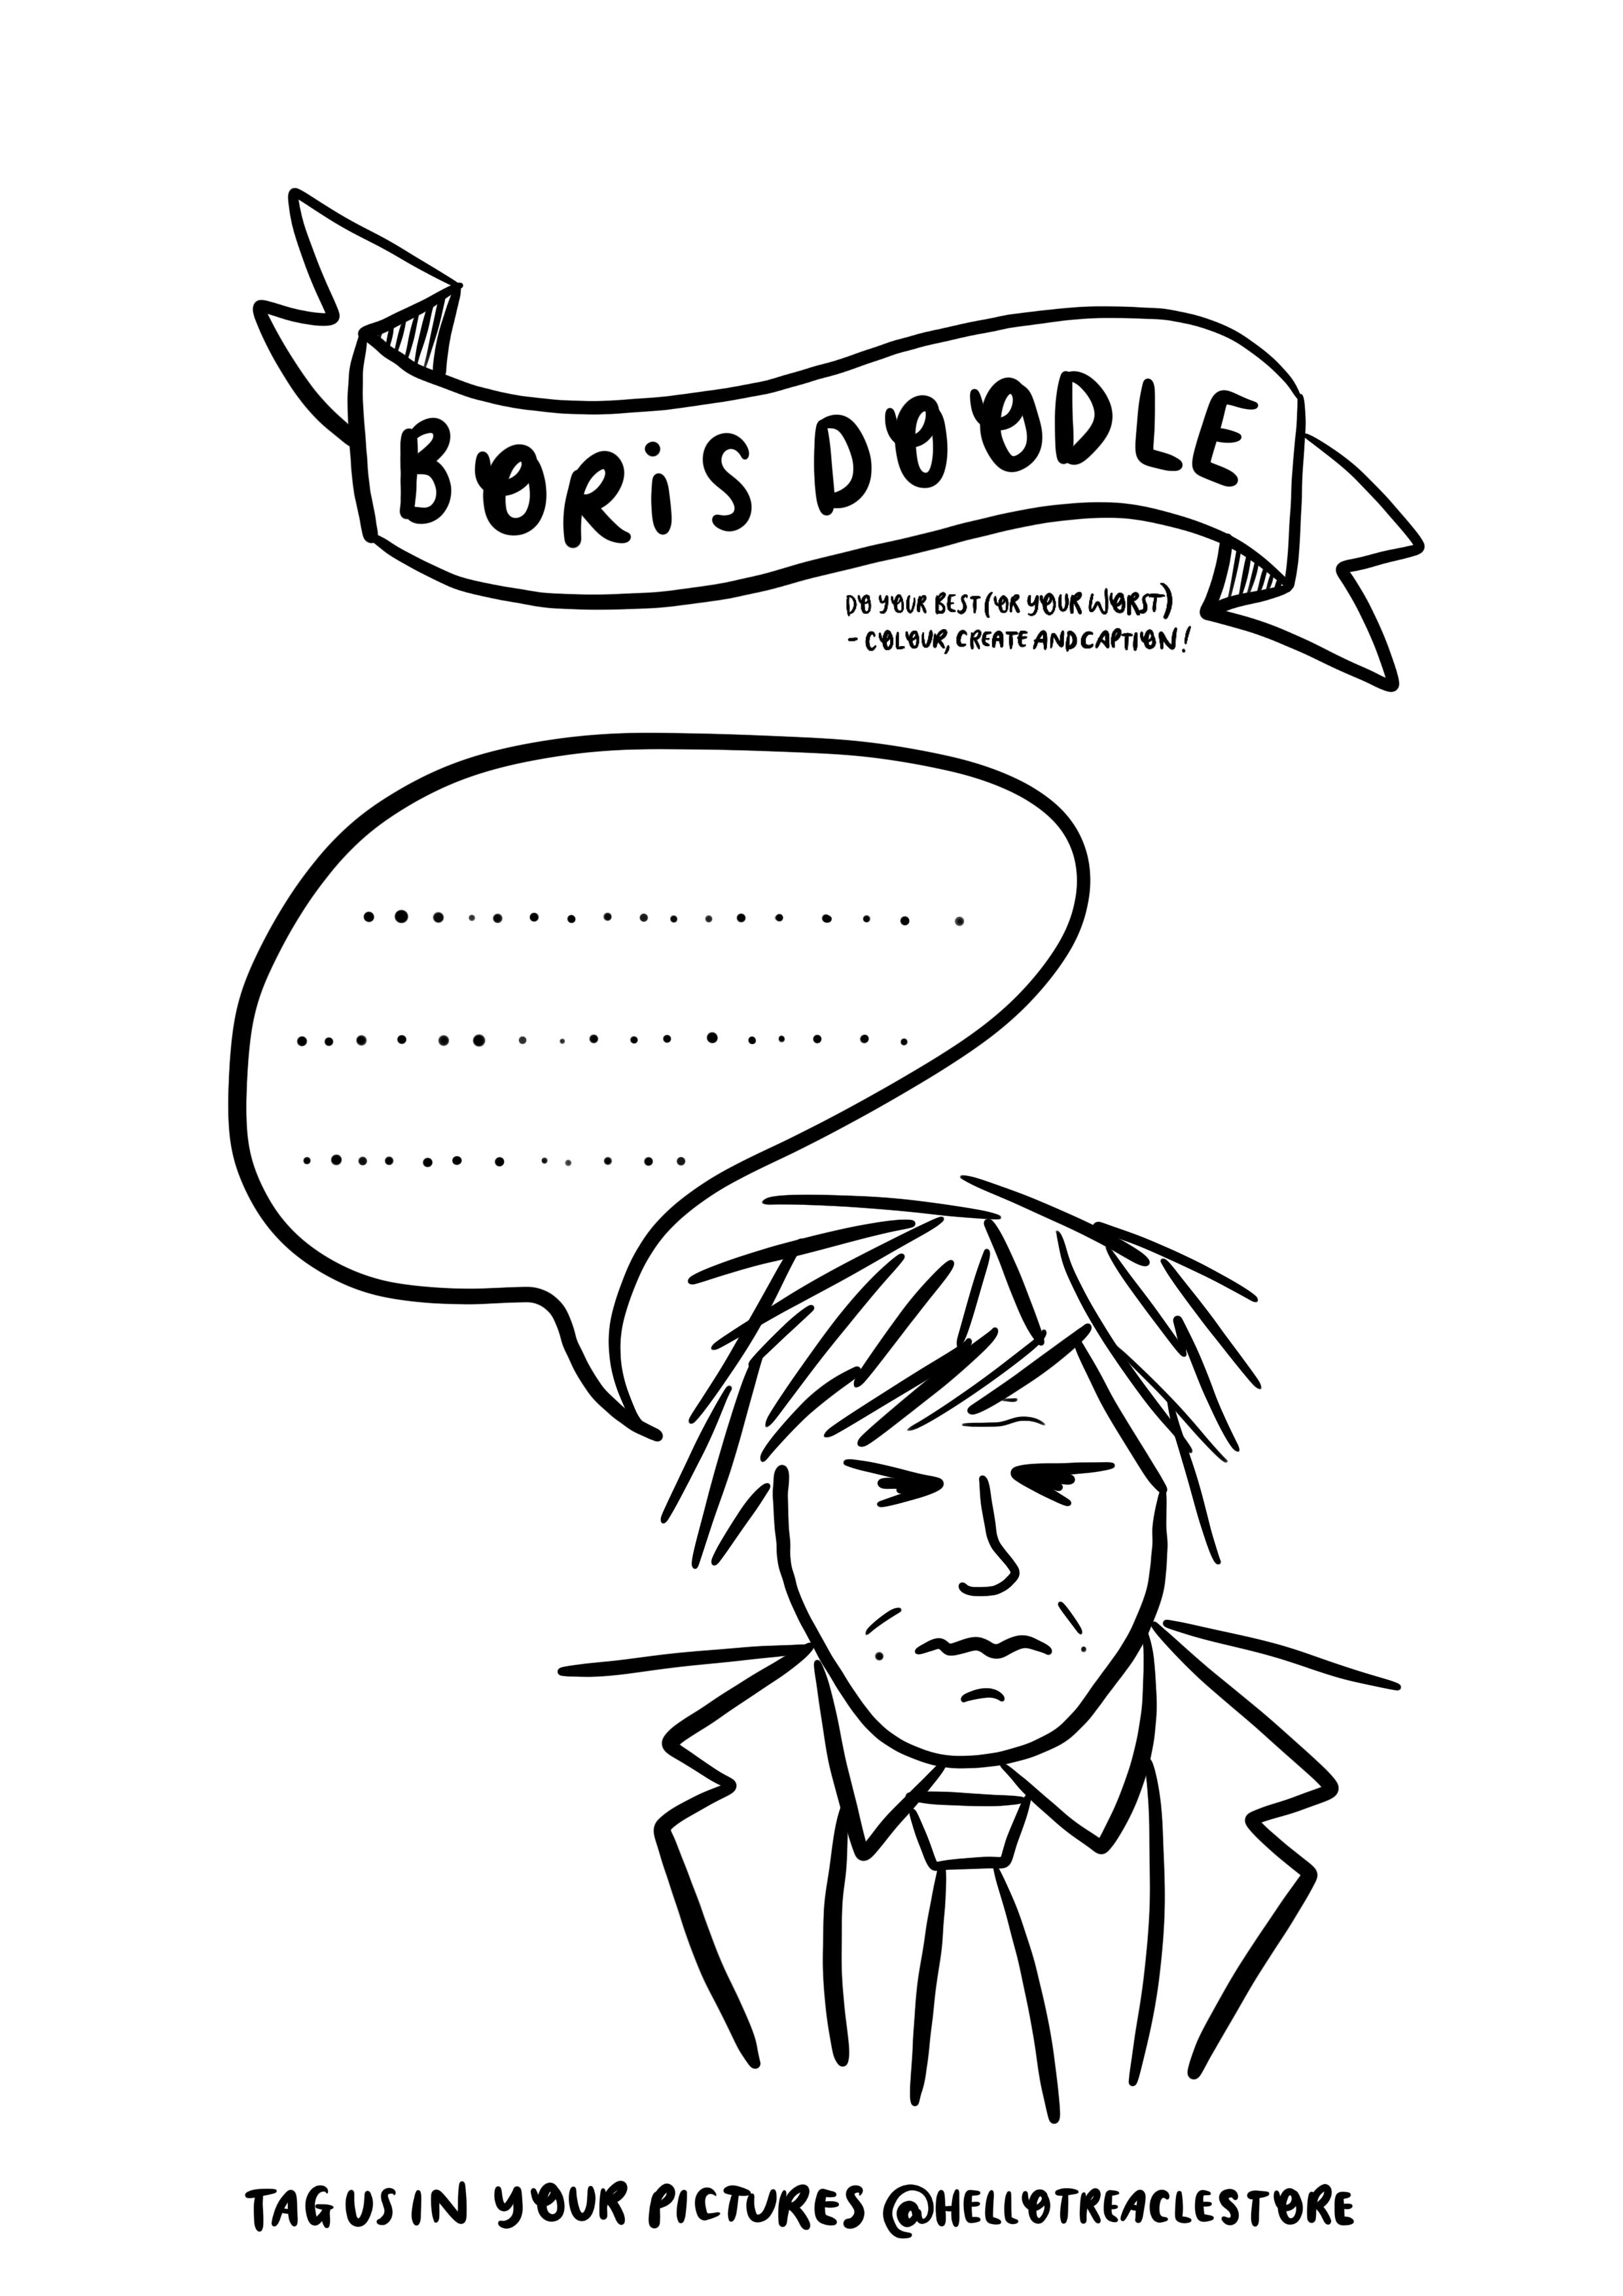 Boris Doodle Free Printable Colouring Sheet Free Printable Coloring Sheets Printable Coloring Sheets Free Printables